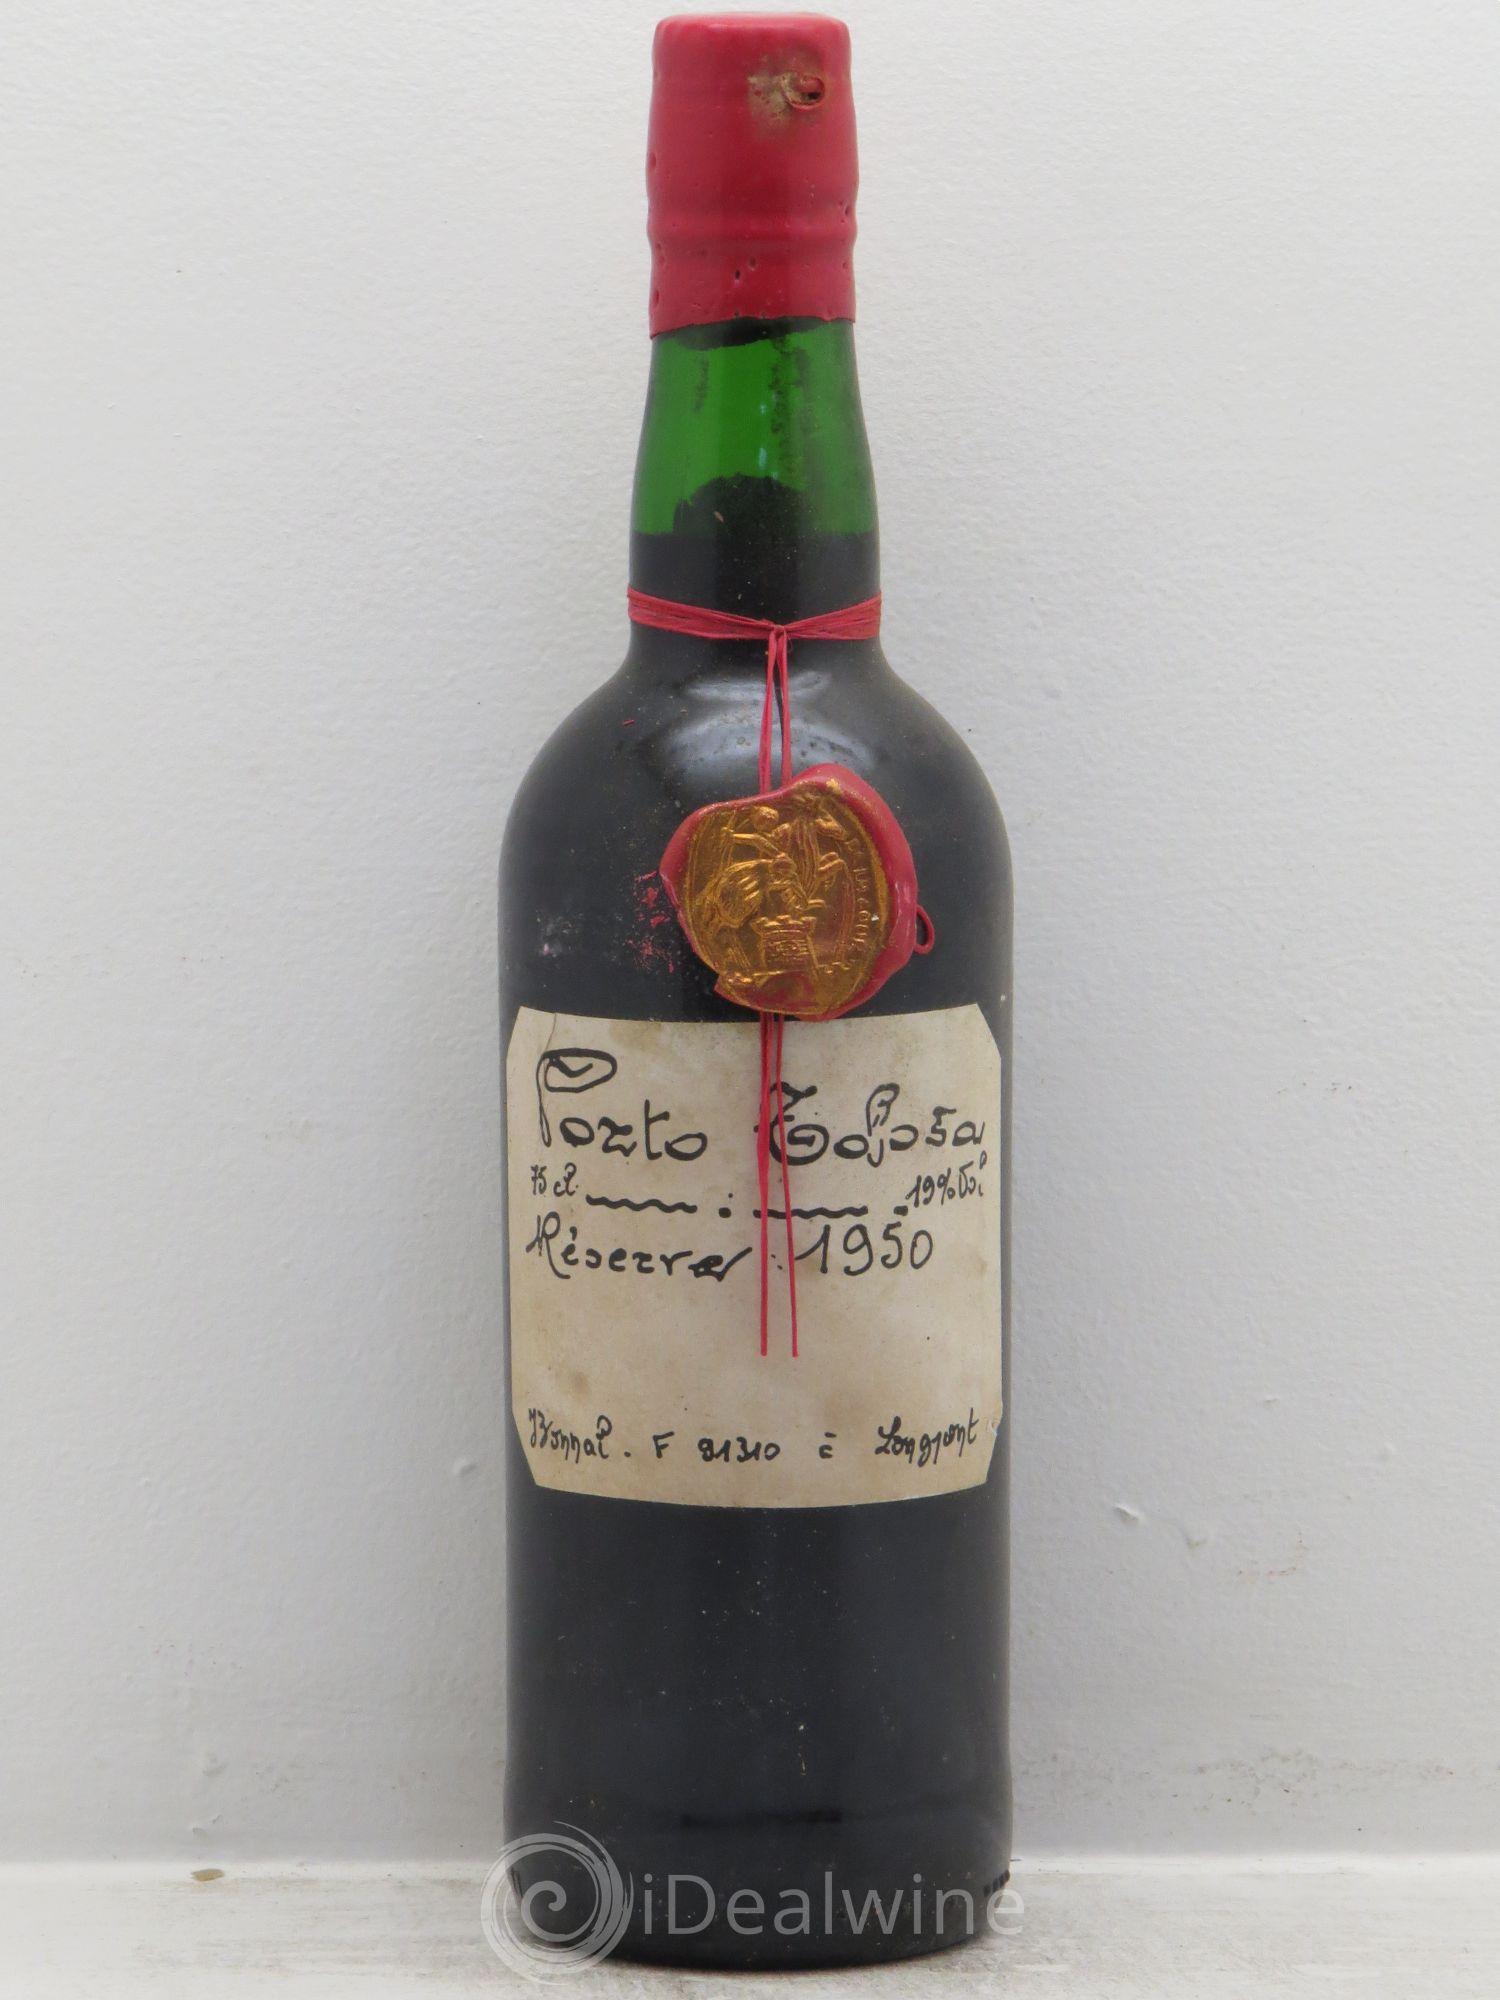 liste des vins de de 1950 1950 en vente idealwine. Black Bedroom Furniture Sets. Home Design Ideas